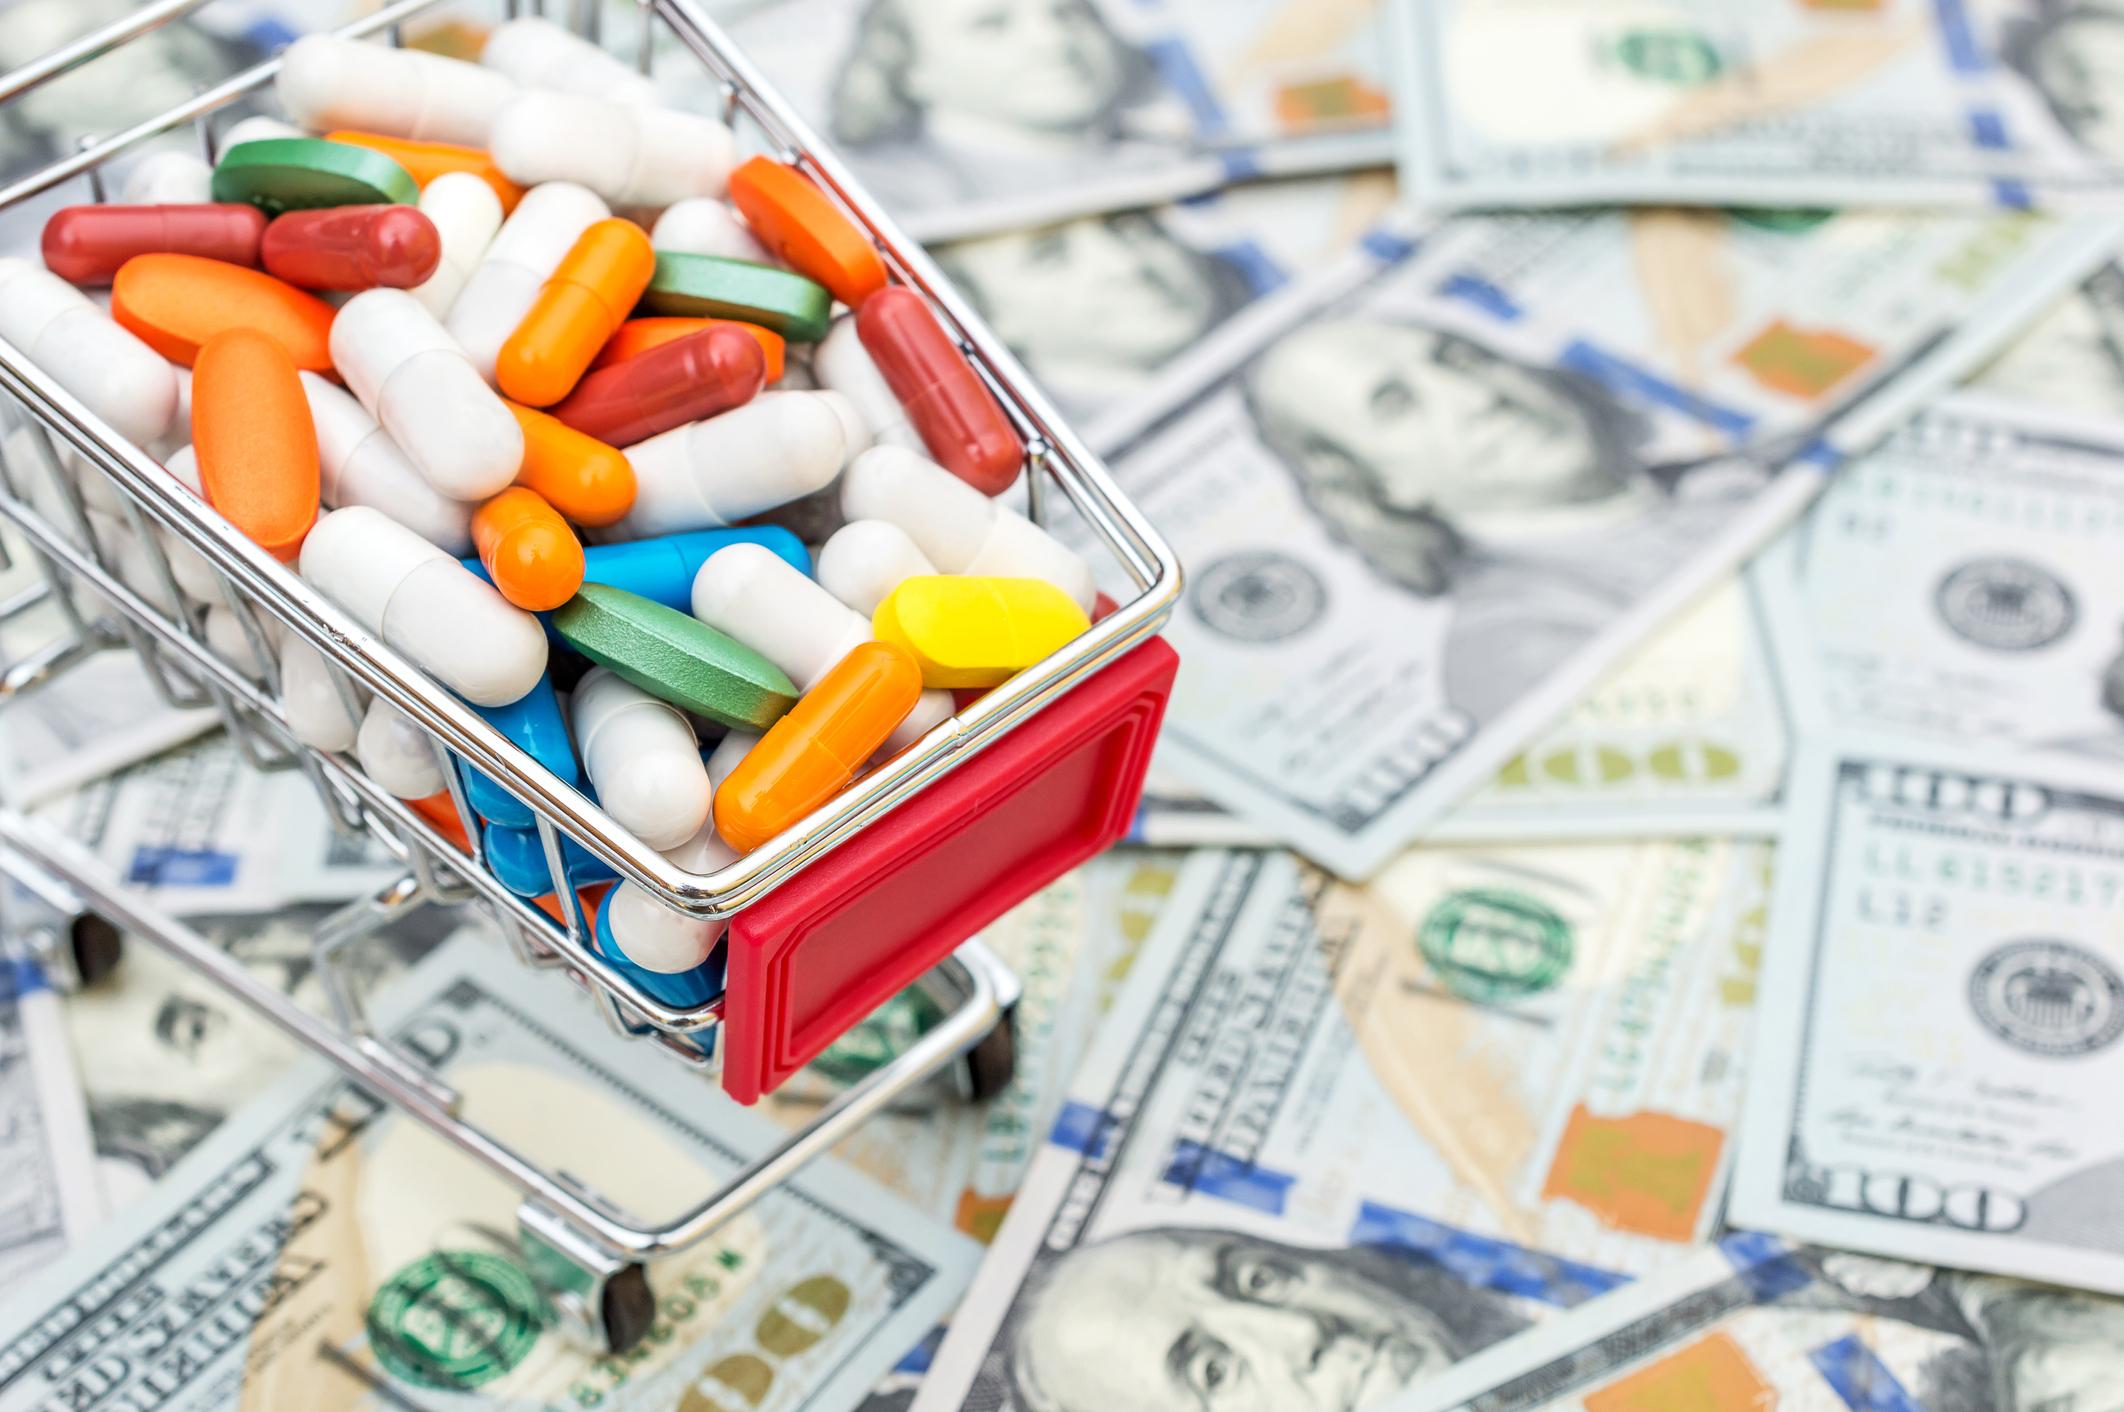 Miniature shopping cart full of pills on a lot of money.